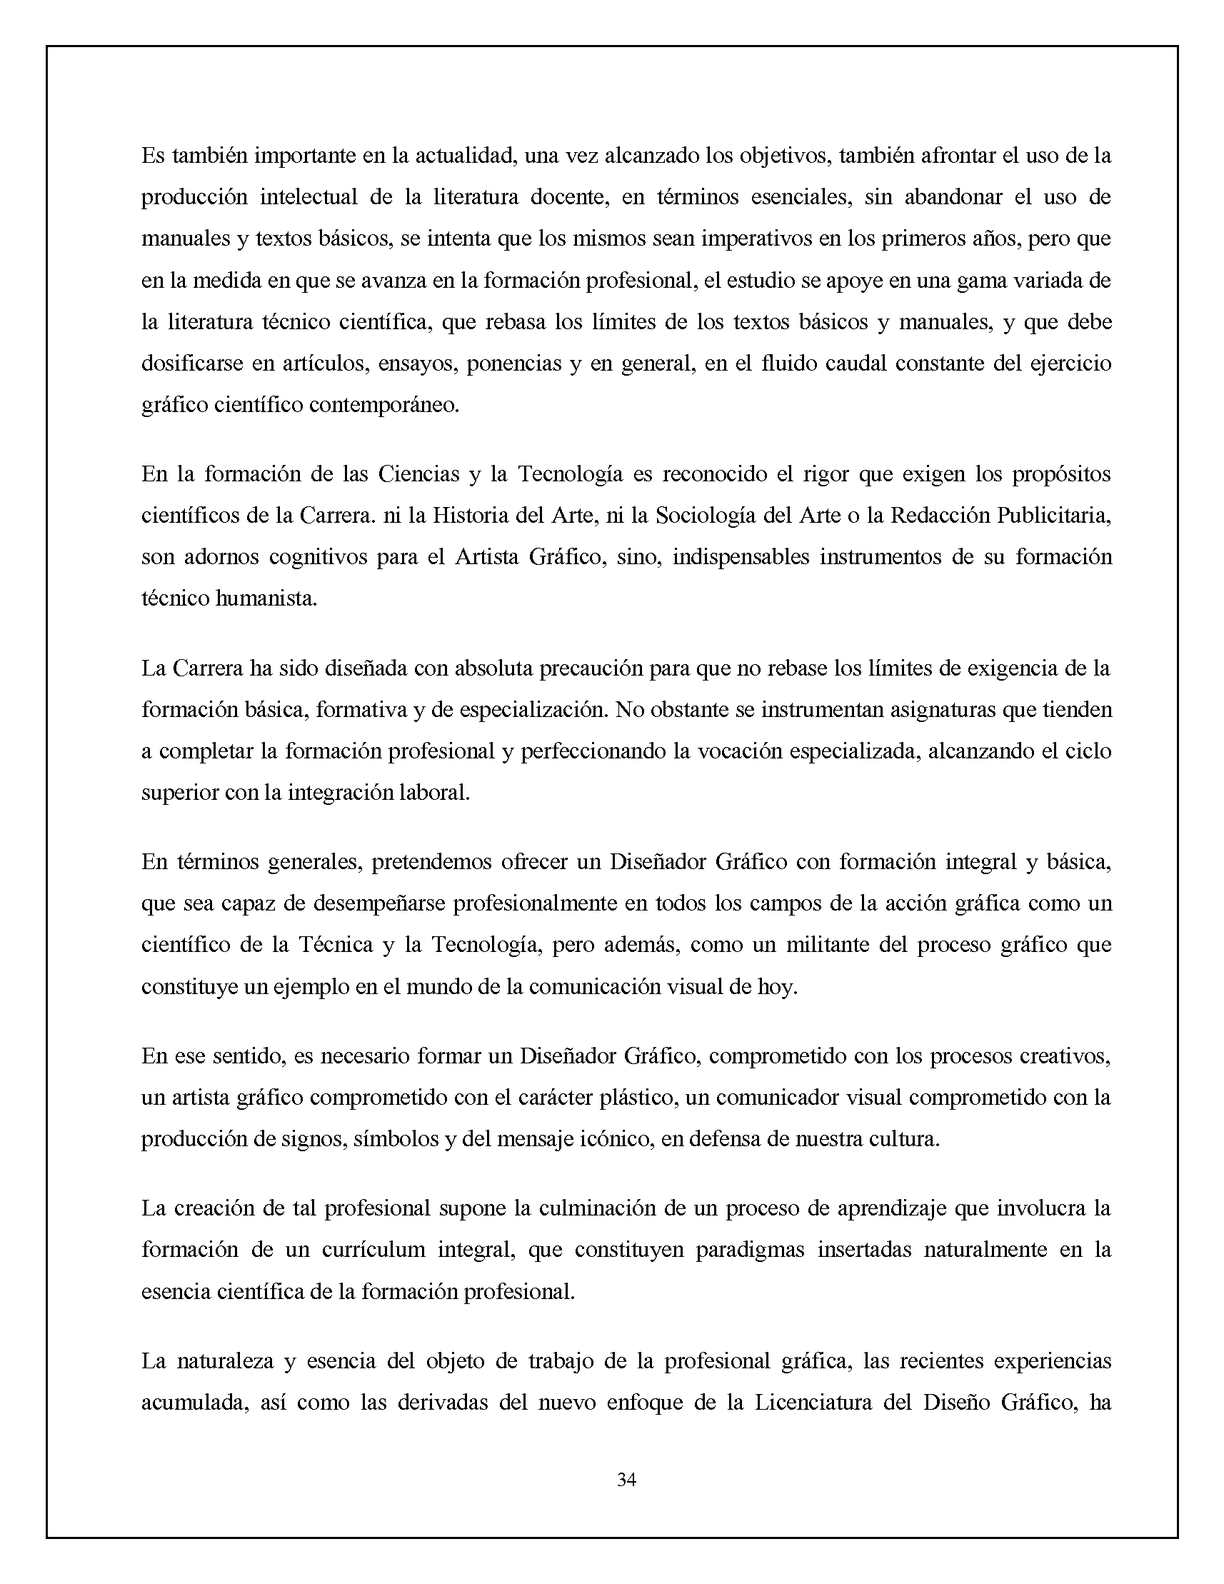 Asombroso Currículum De Maestros De Arte Sin Experiencia Docente ...